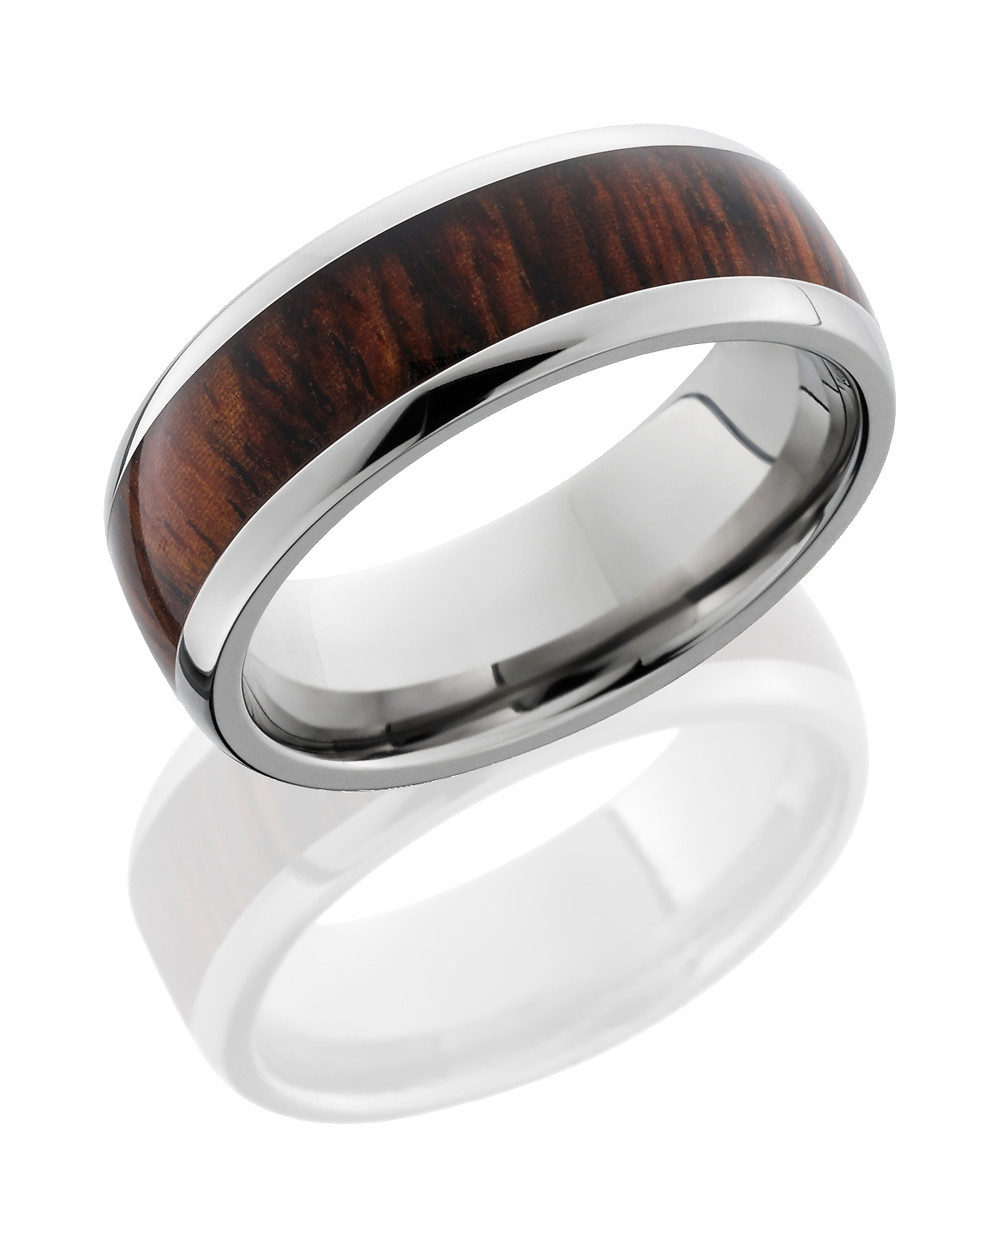 Handwood Ring - Carats & Stones